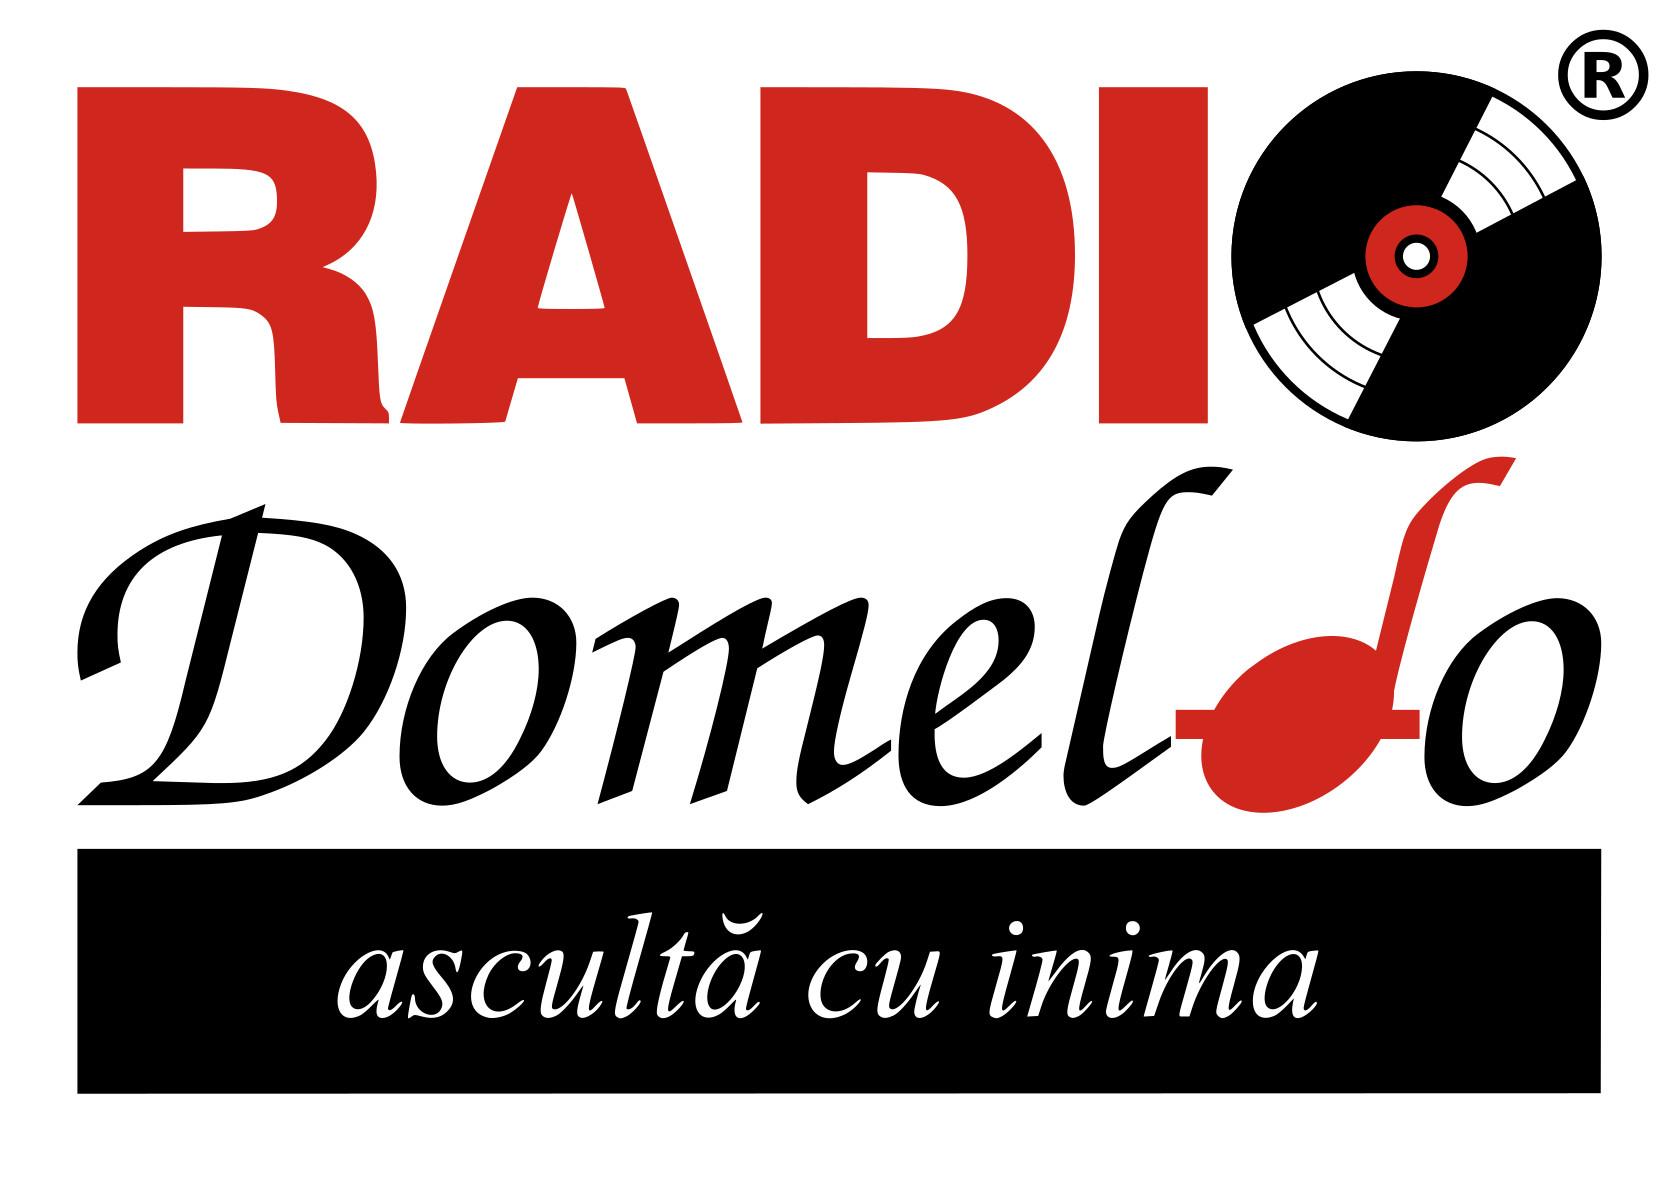 Radio Domeldo